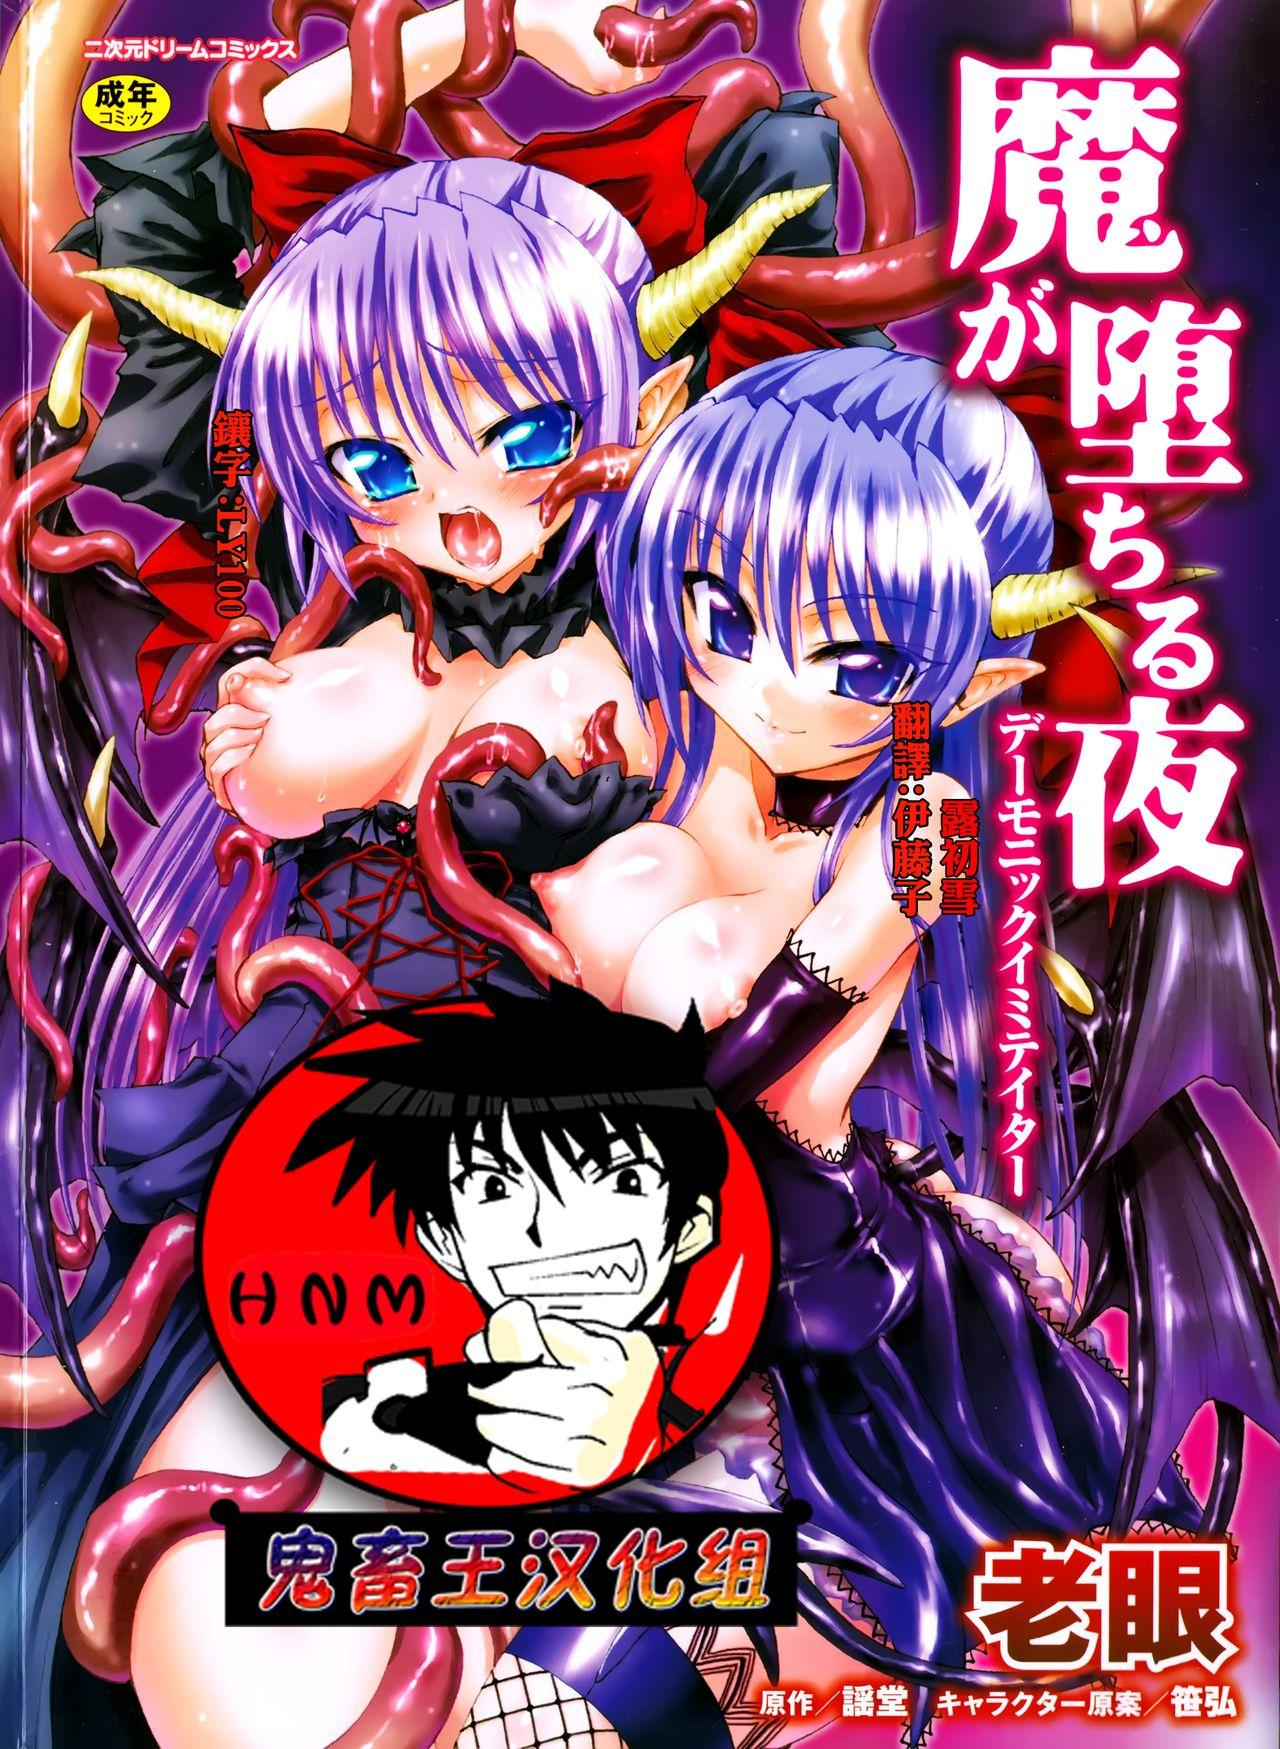 Ma ga Ochiru Yoru Demonic Imitator CH.1-7 0